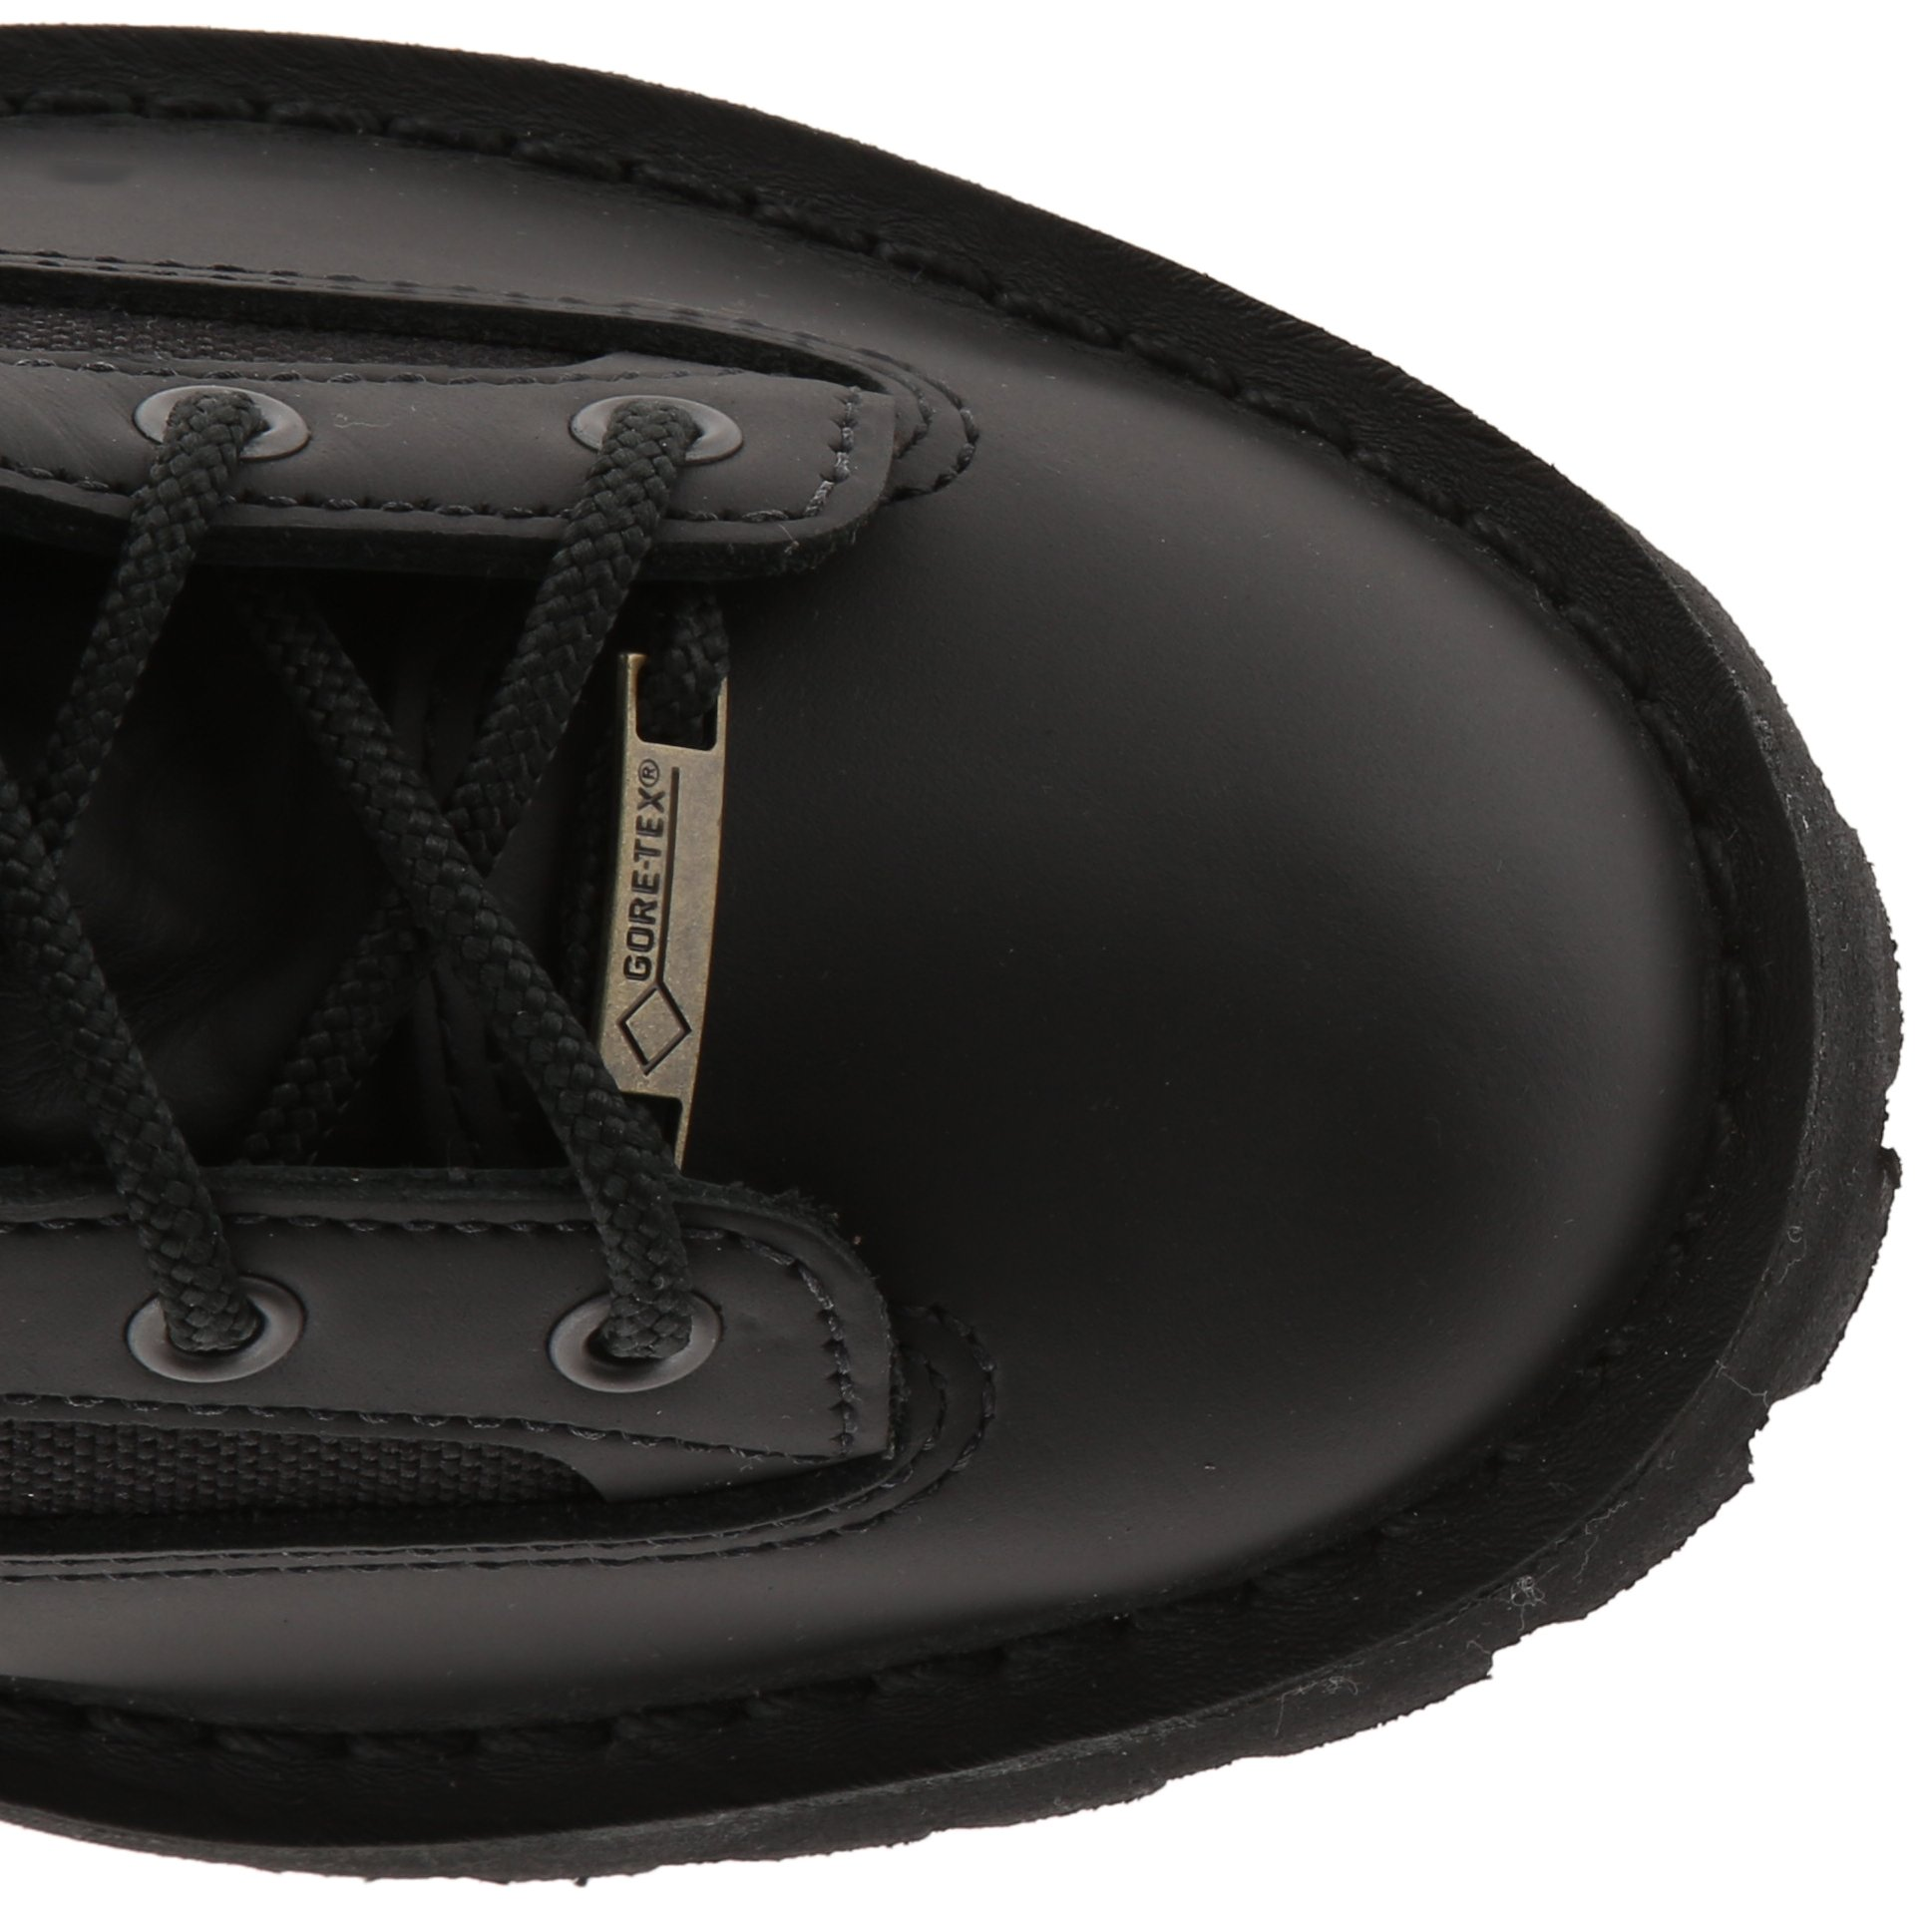 Danner Men's Acadia 8'' 200G Military and Tactical Boot, Black, 13 B US by Danner (Image #7)